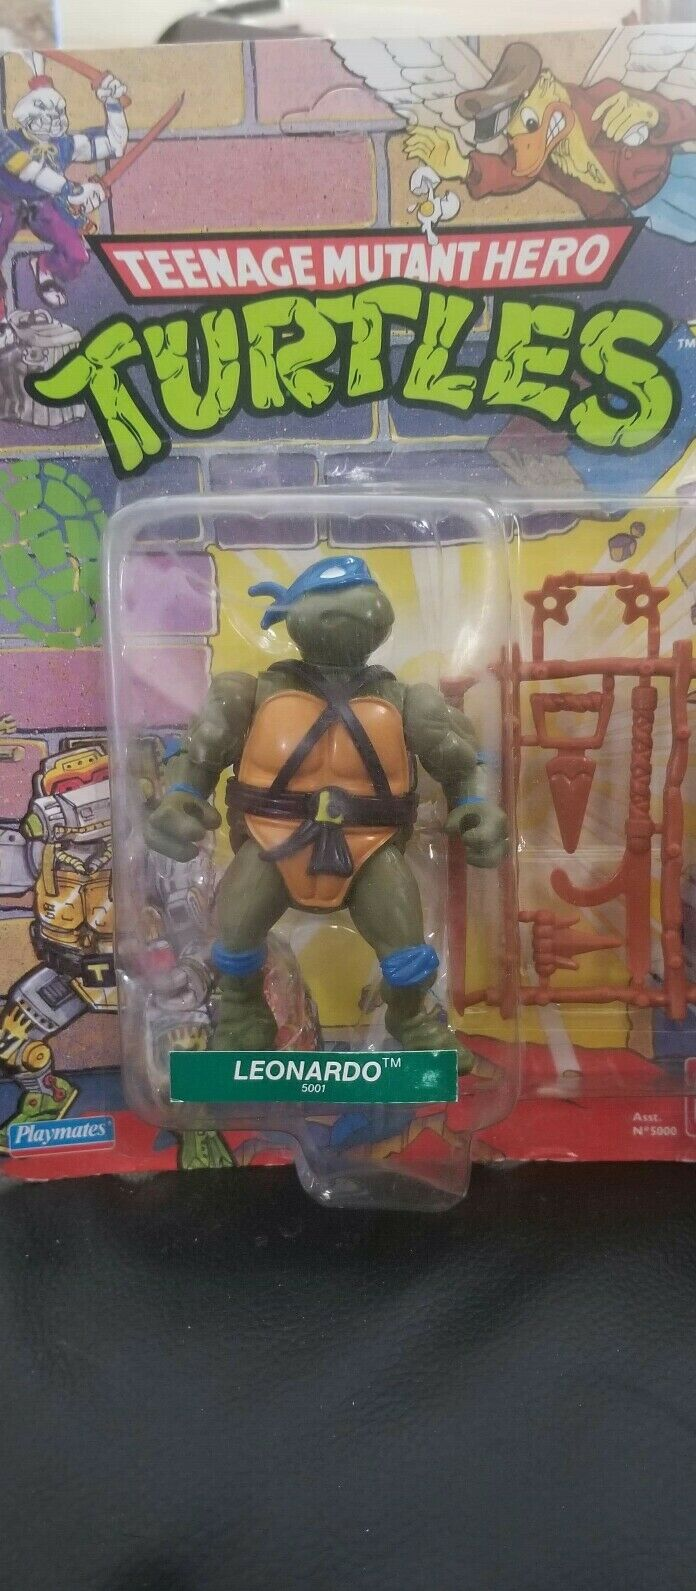 Teenage mutant ninja ninja ninja turtles collectibles 9d12d7